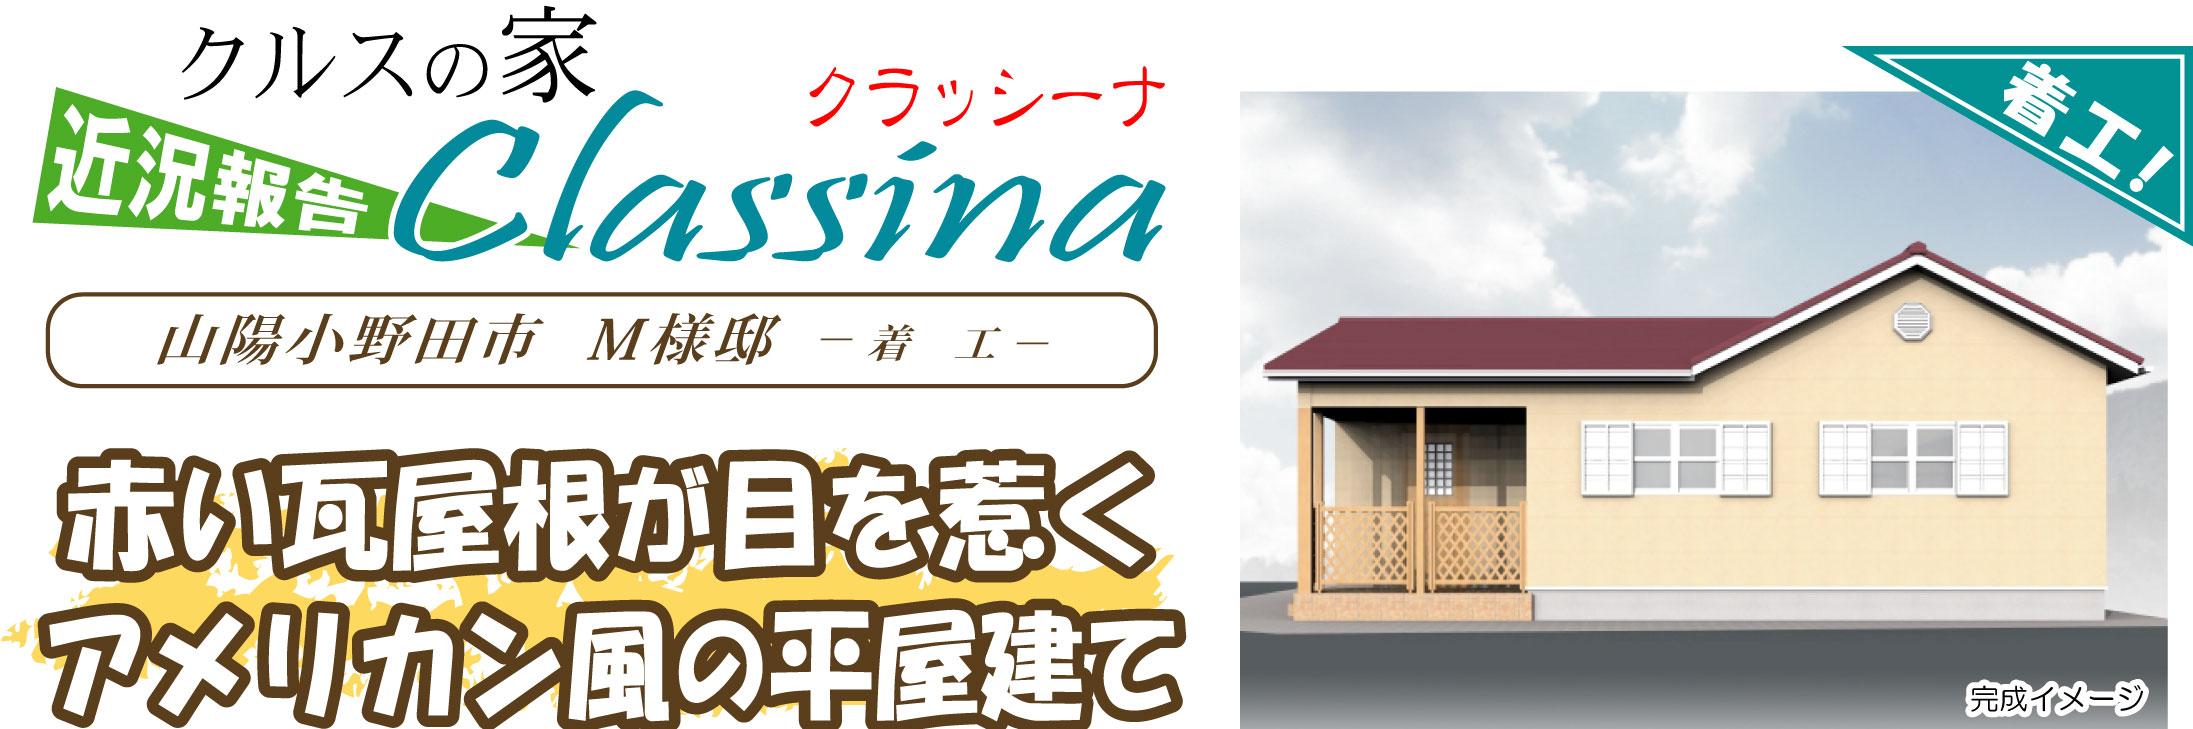 KuraSi-natu-sin65-02.jpg